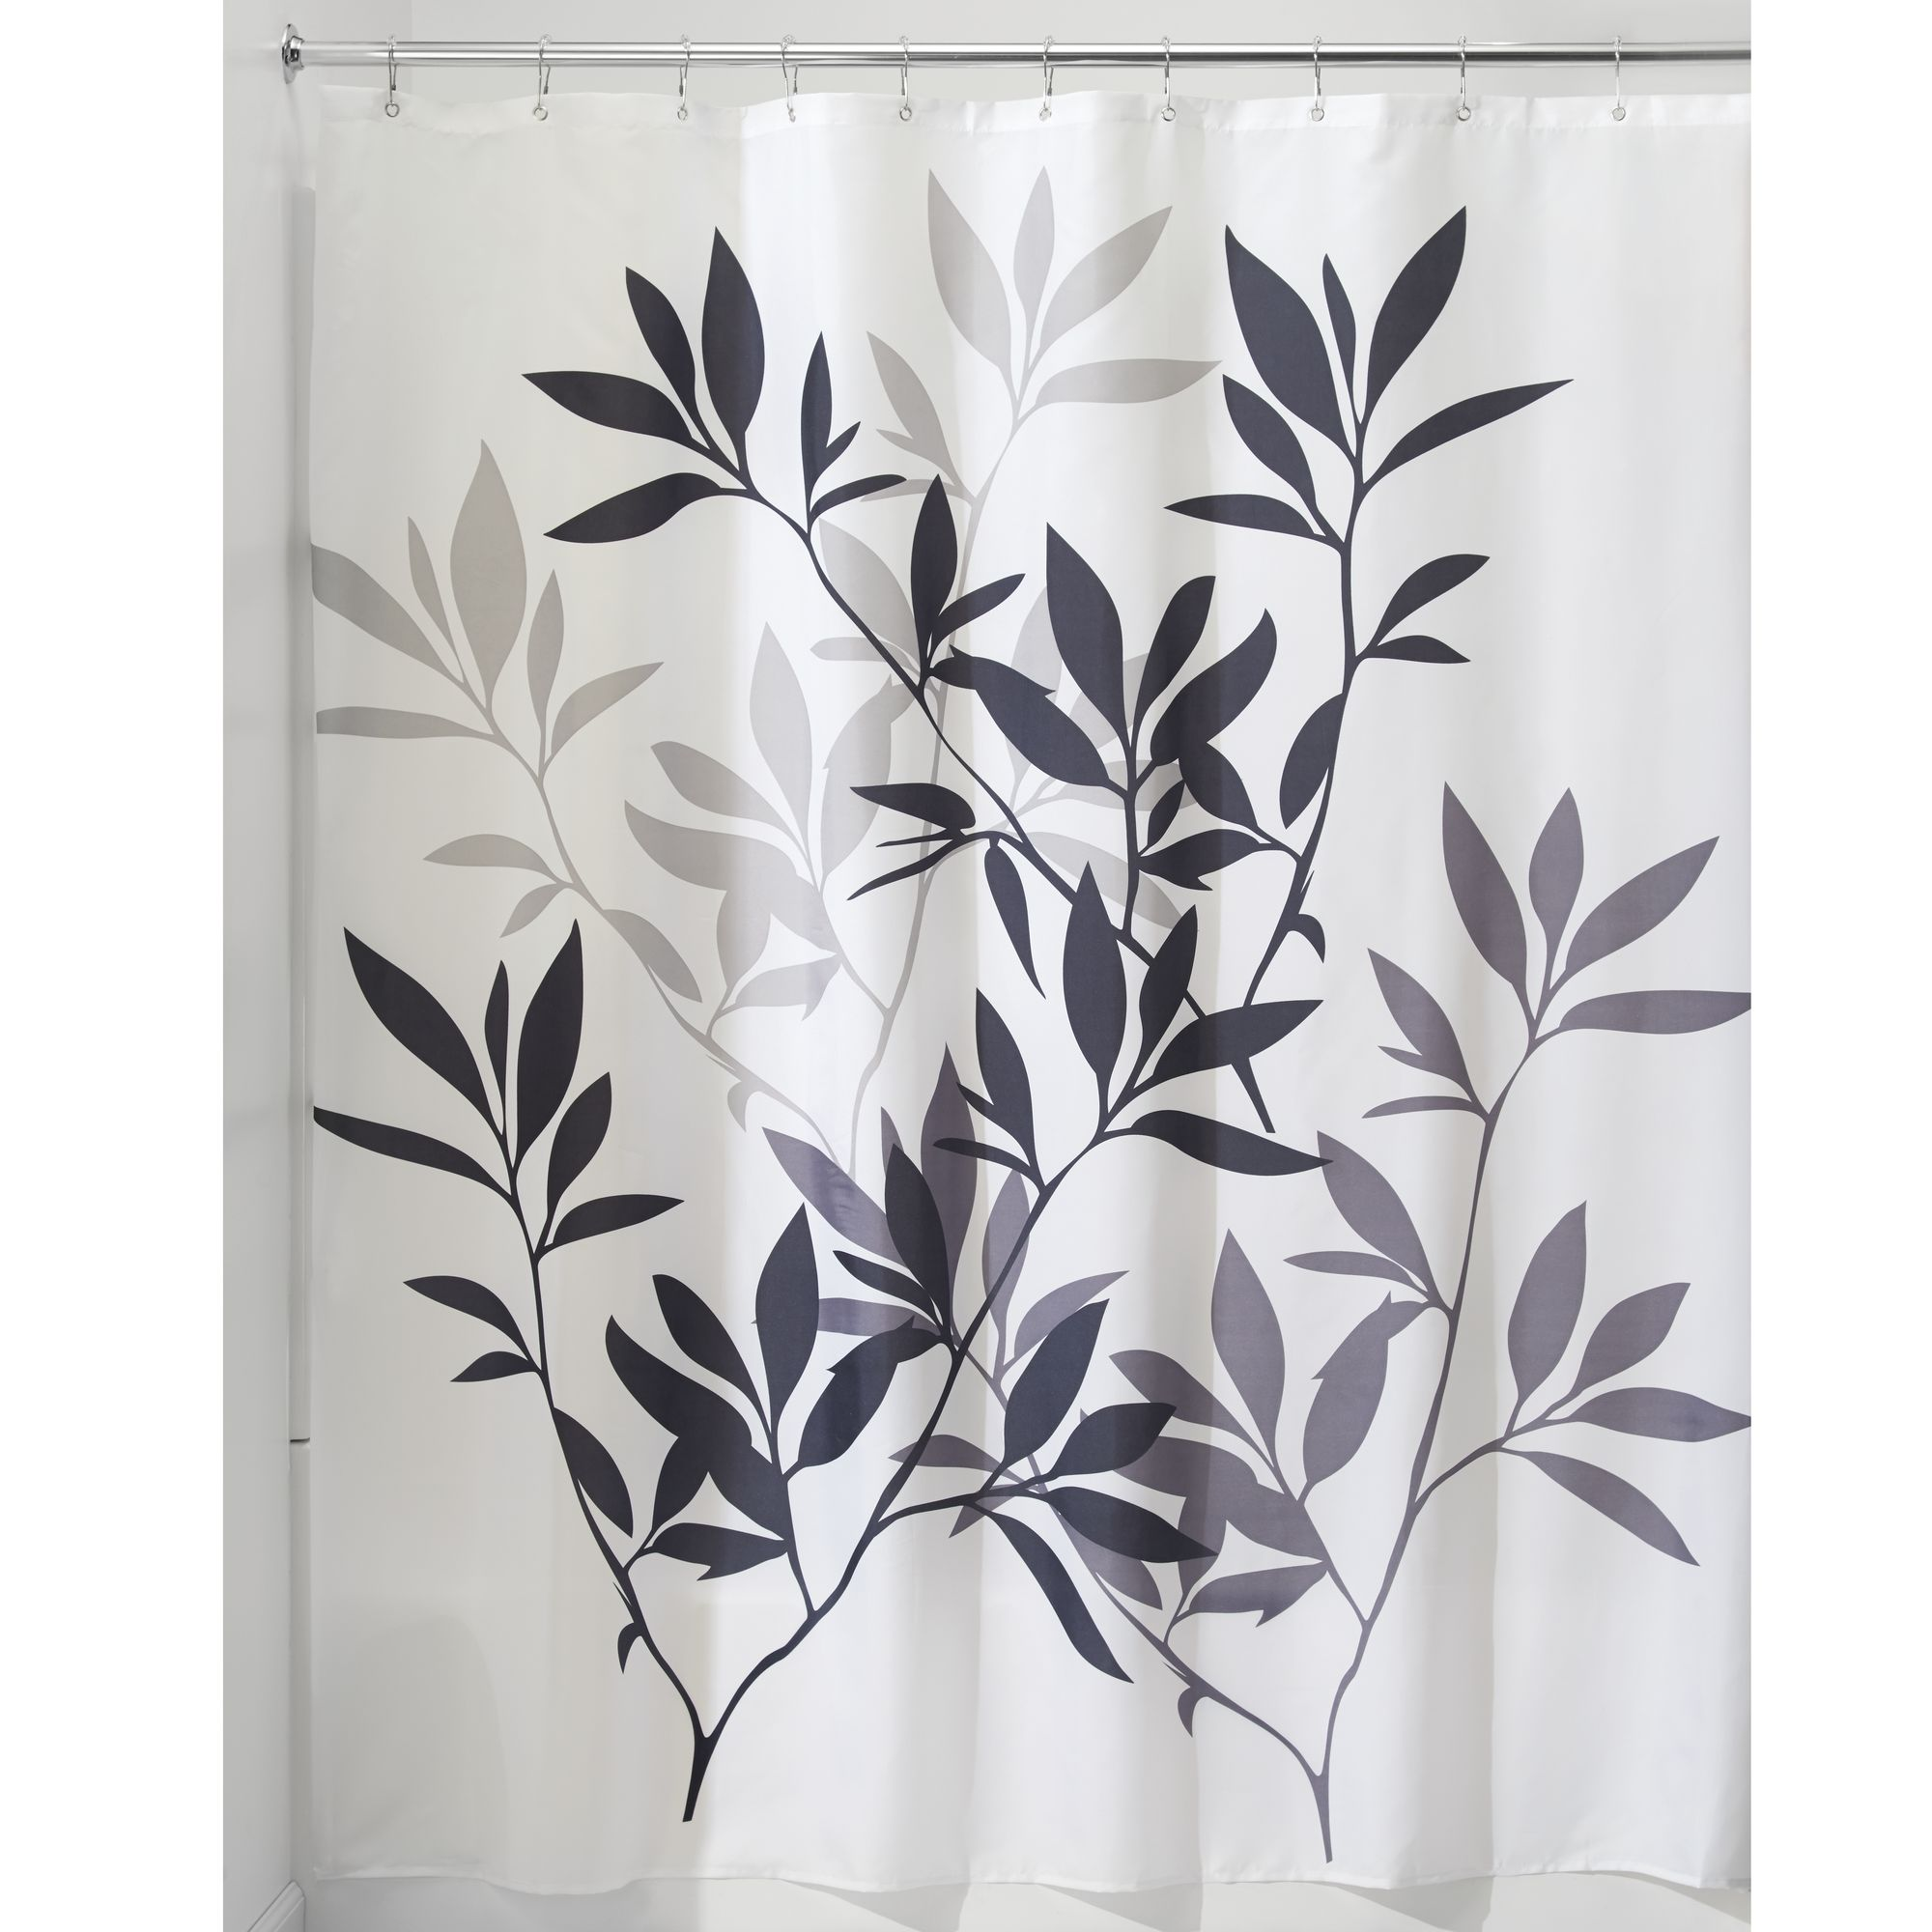 "InterDesign Leaves Fabric Shower Curtain, Standard 72"" x 72"", Purple"